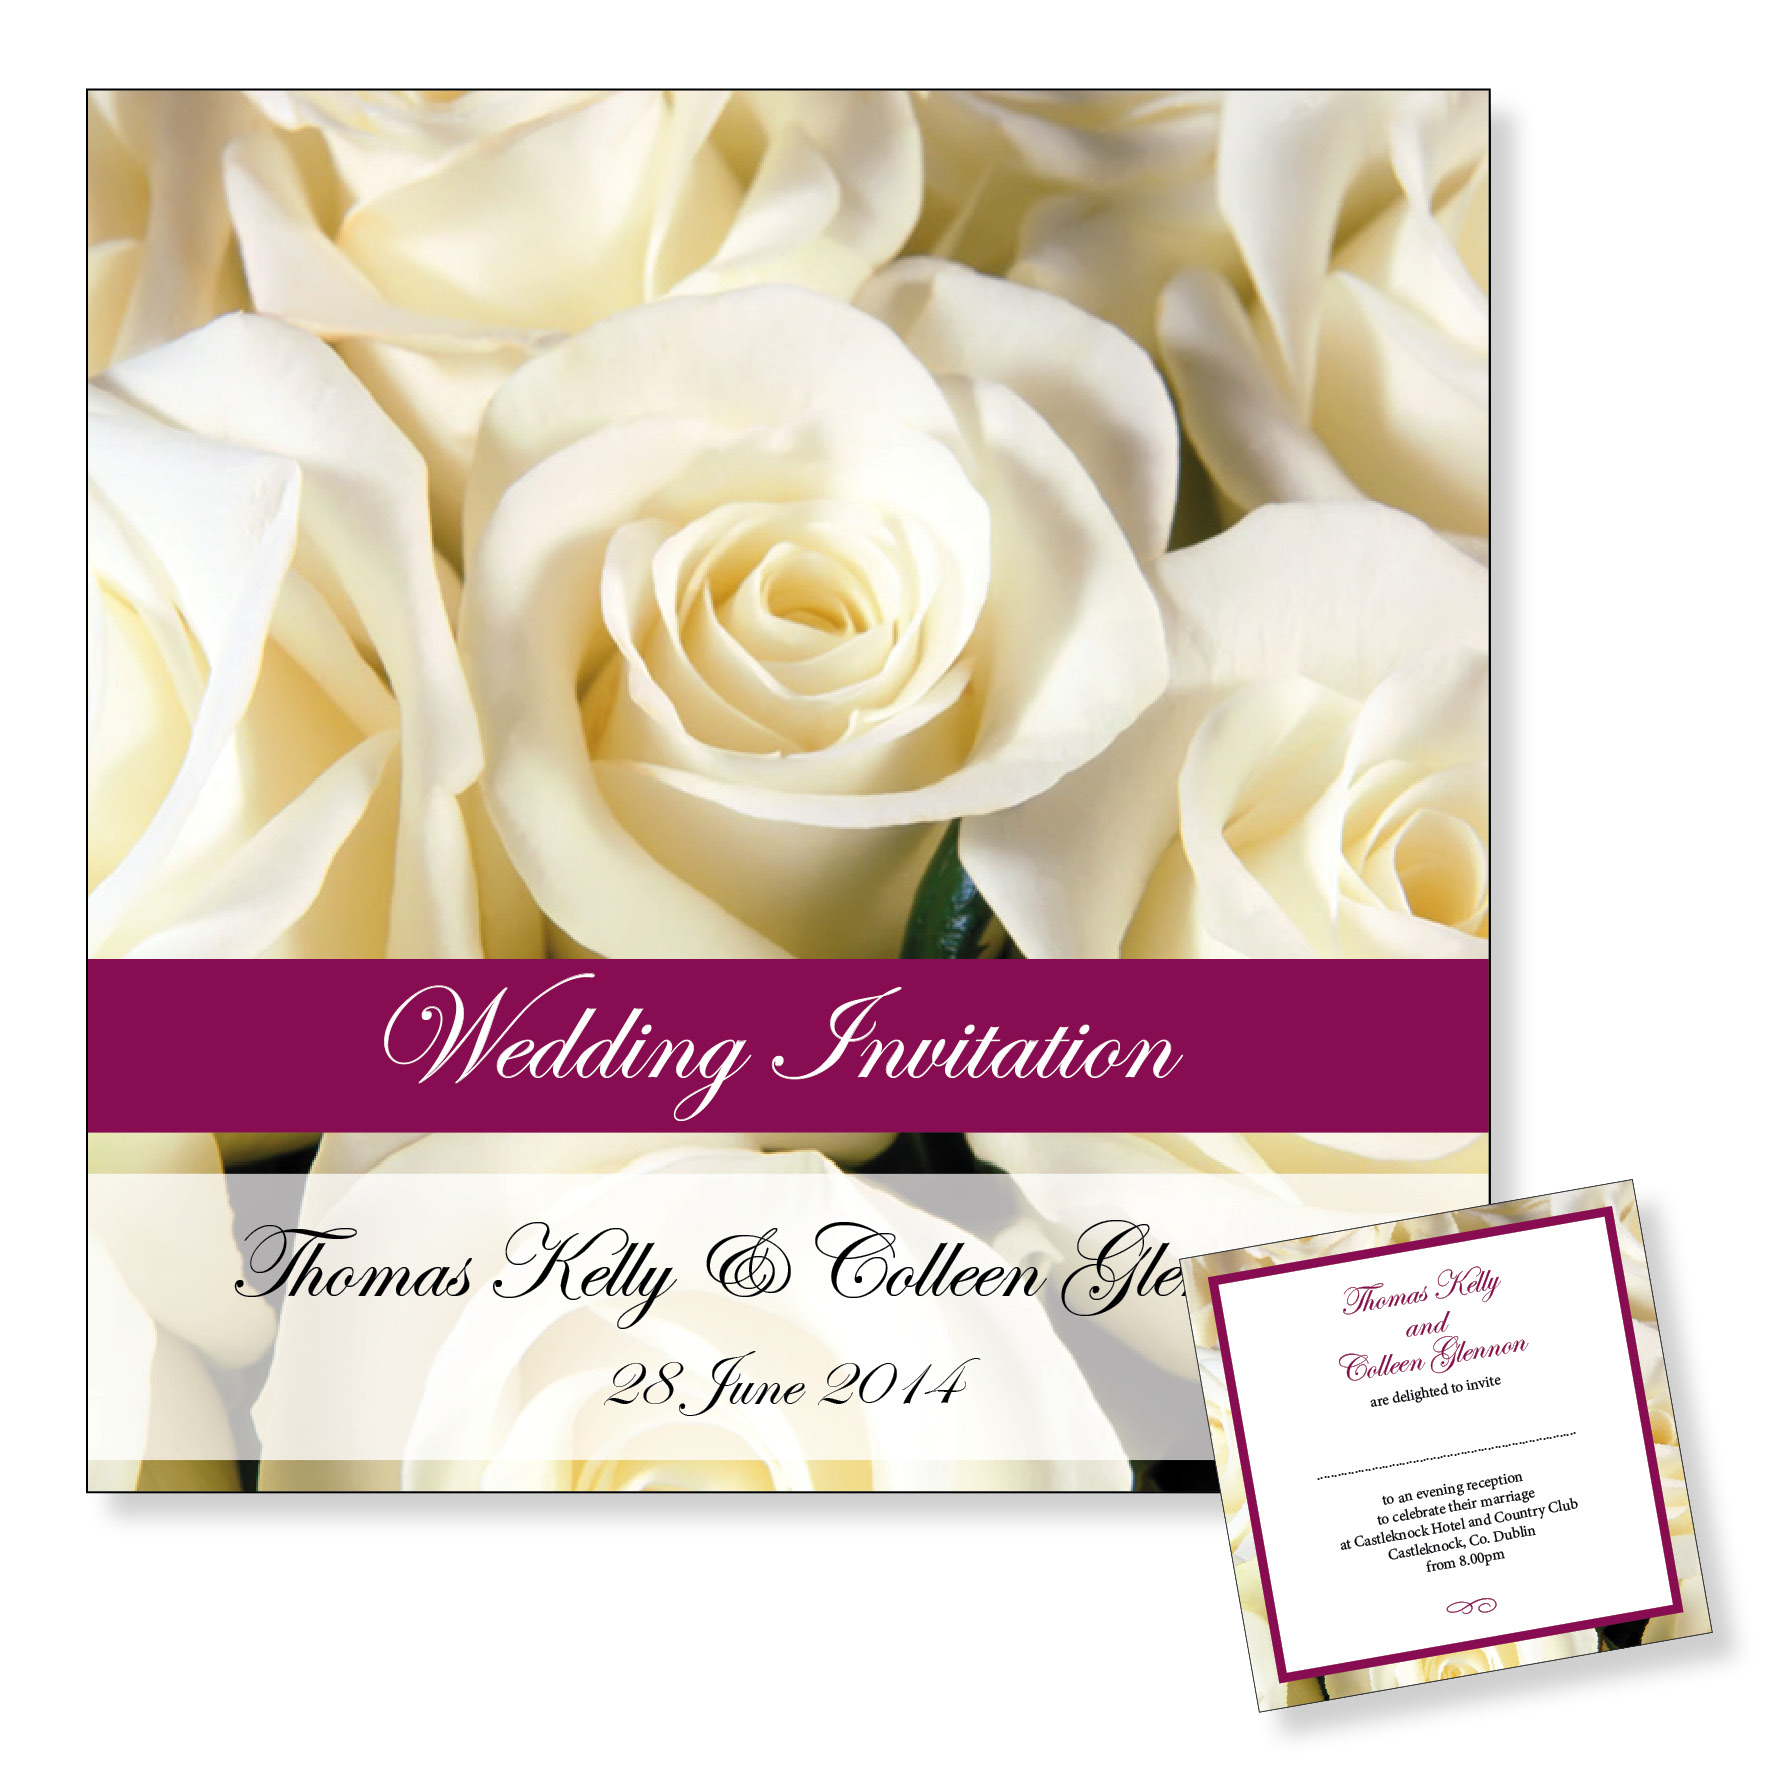 Evening wedding invitation - White roses